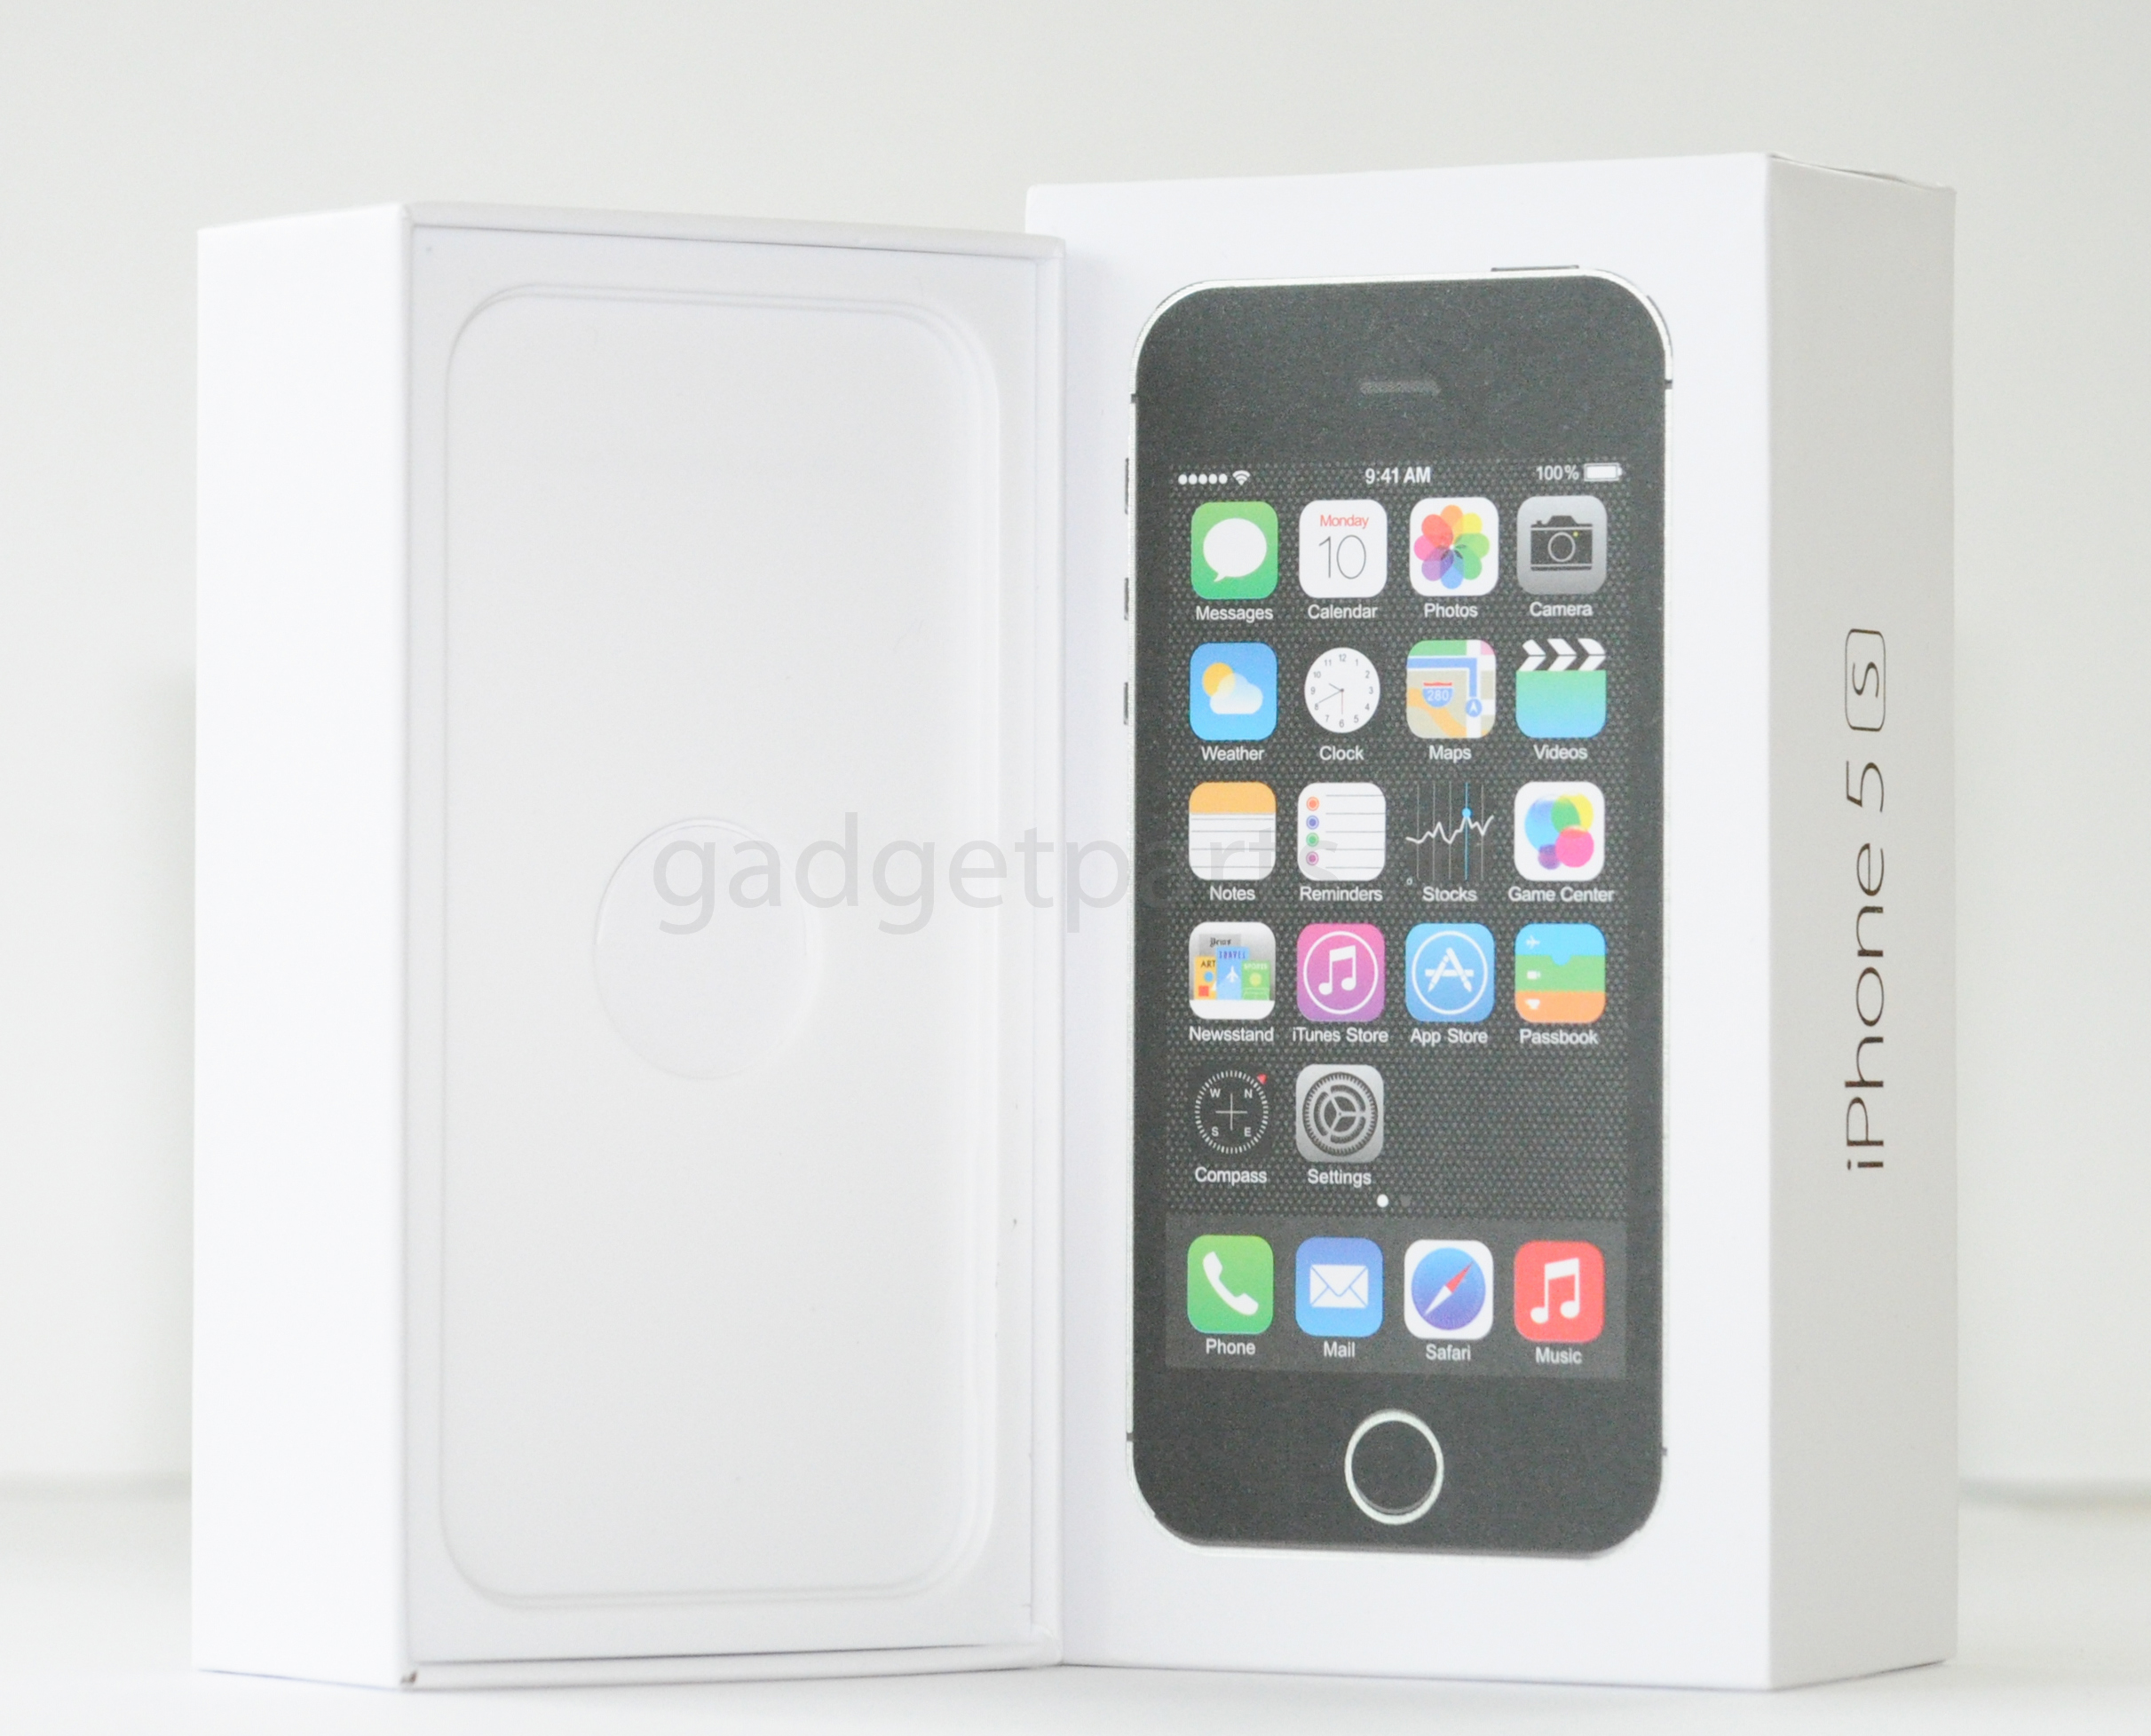 Обои для iphone 5s на черном фоне